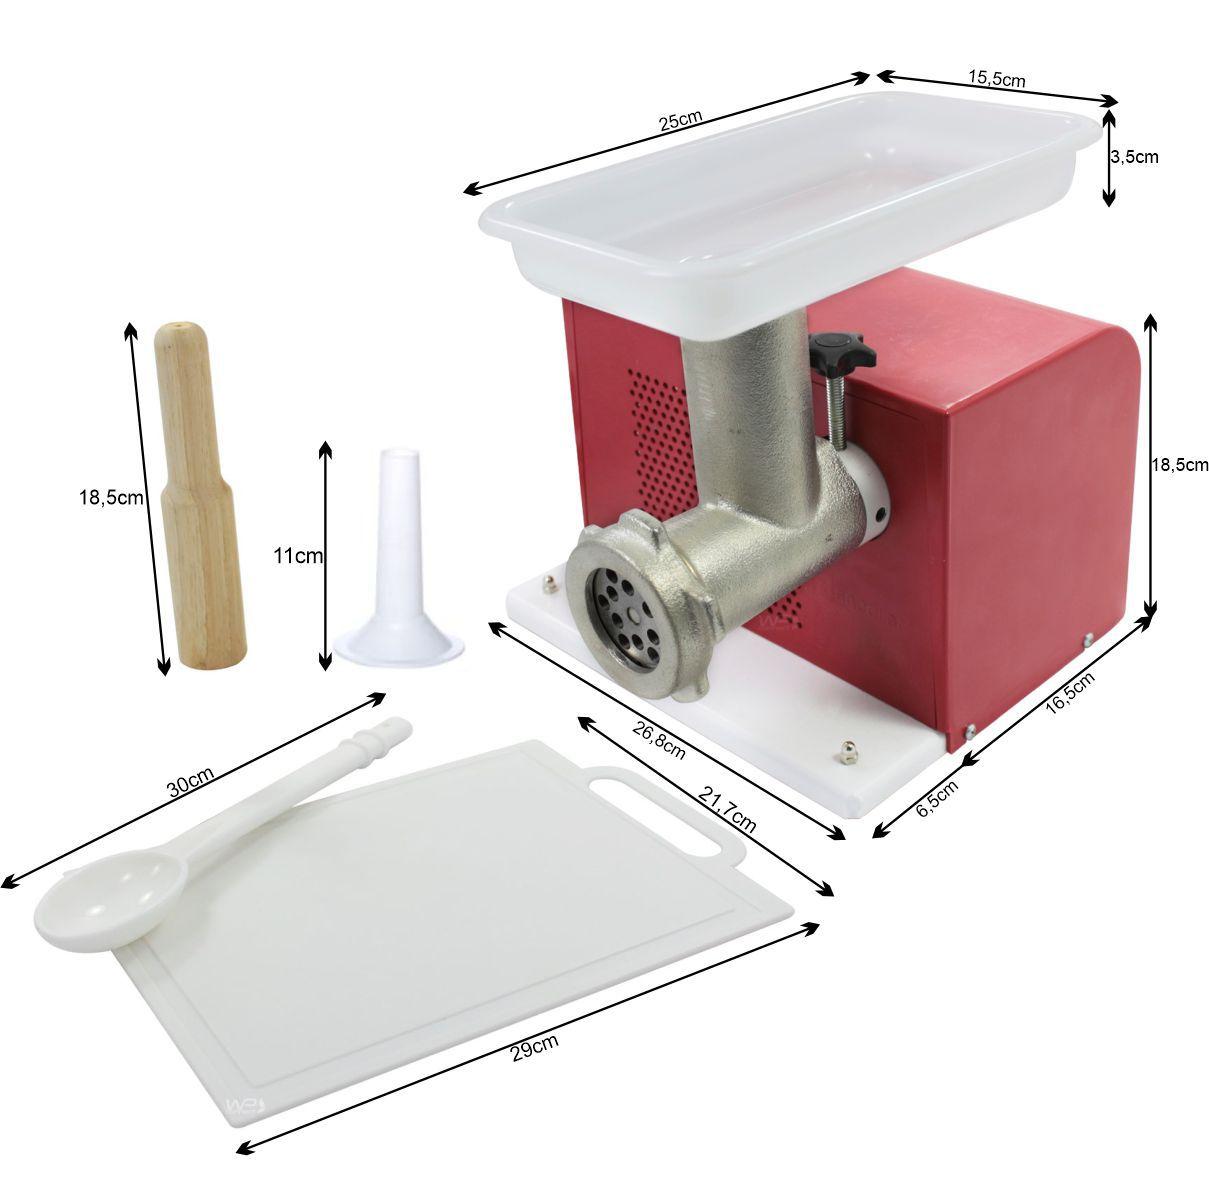 Máquina de Moer Carne Bocal 05 Elétrica - Vermelho